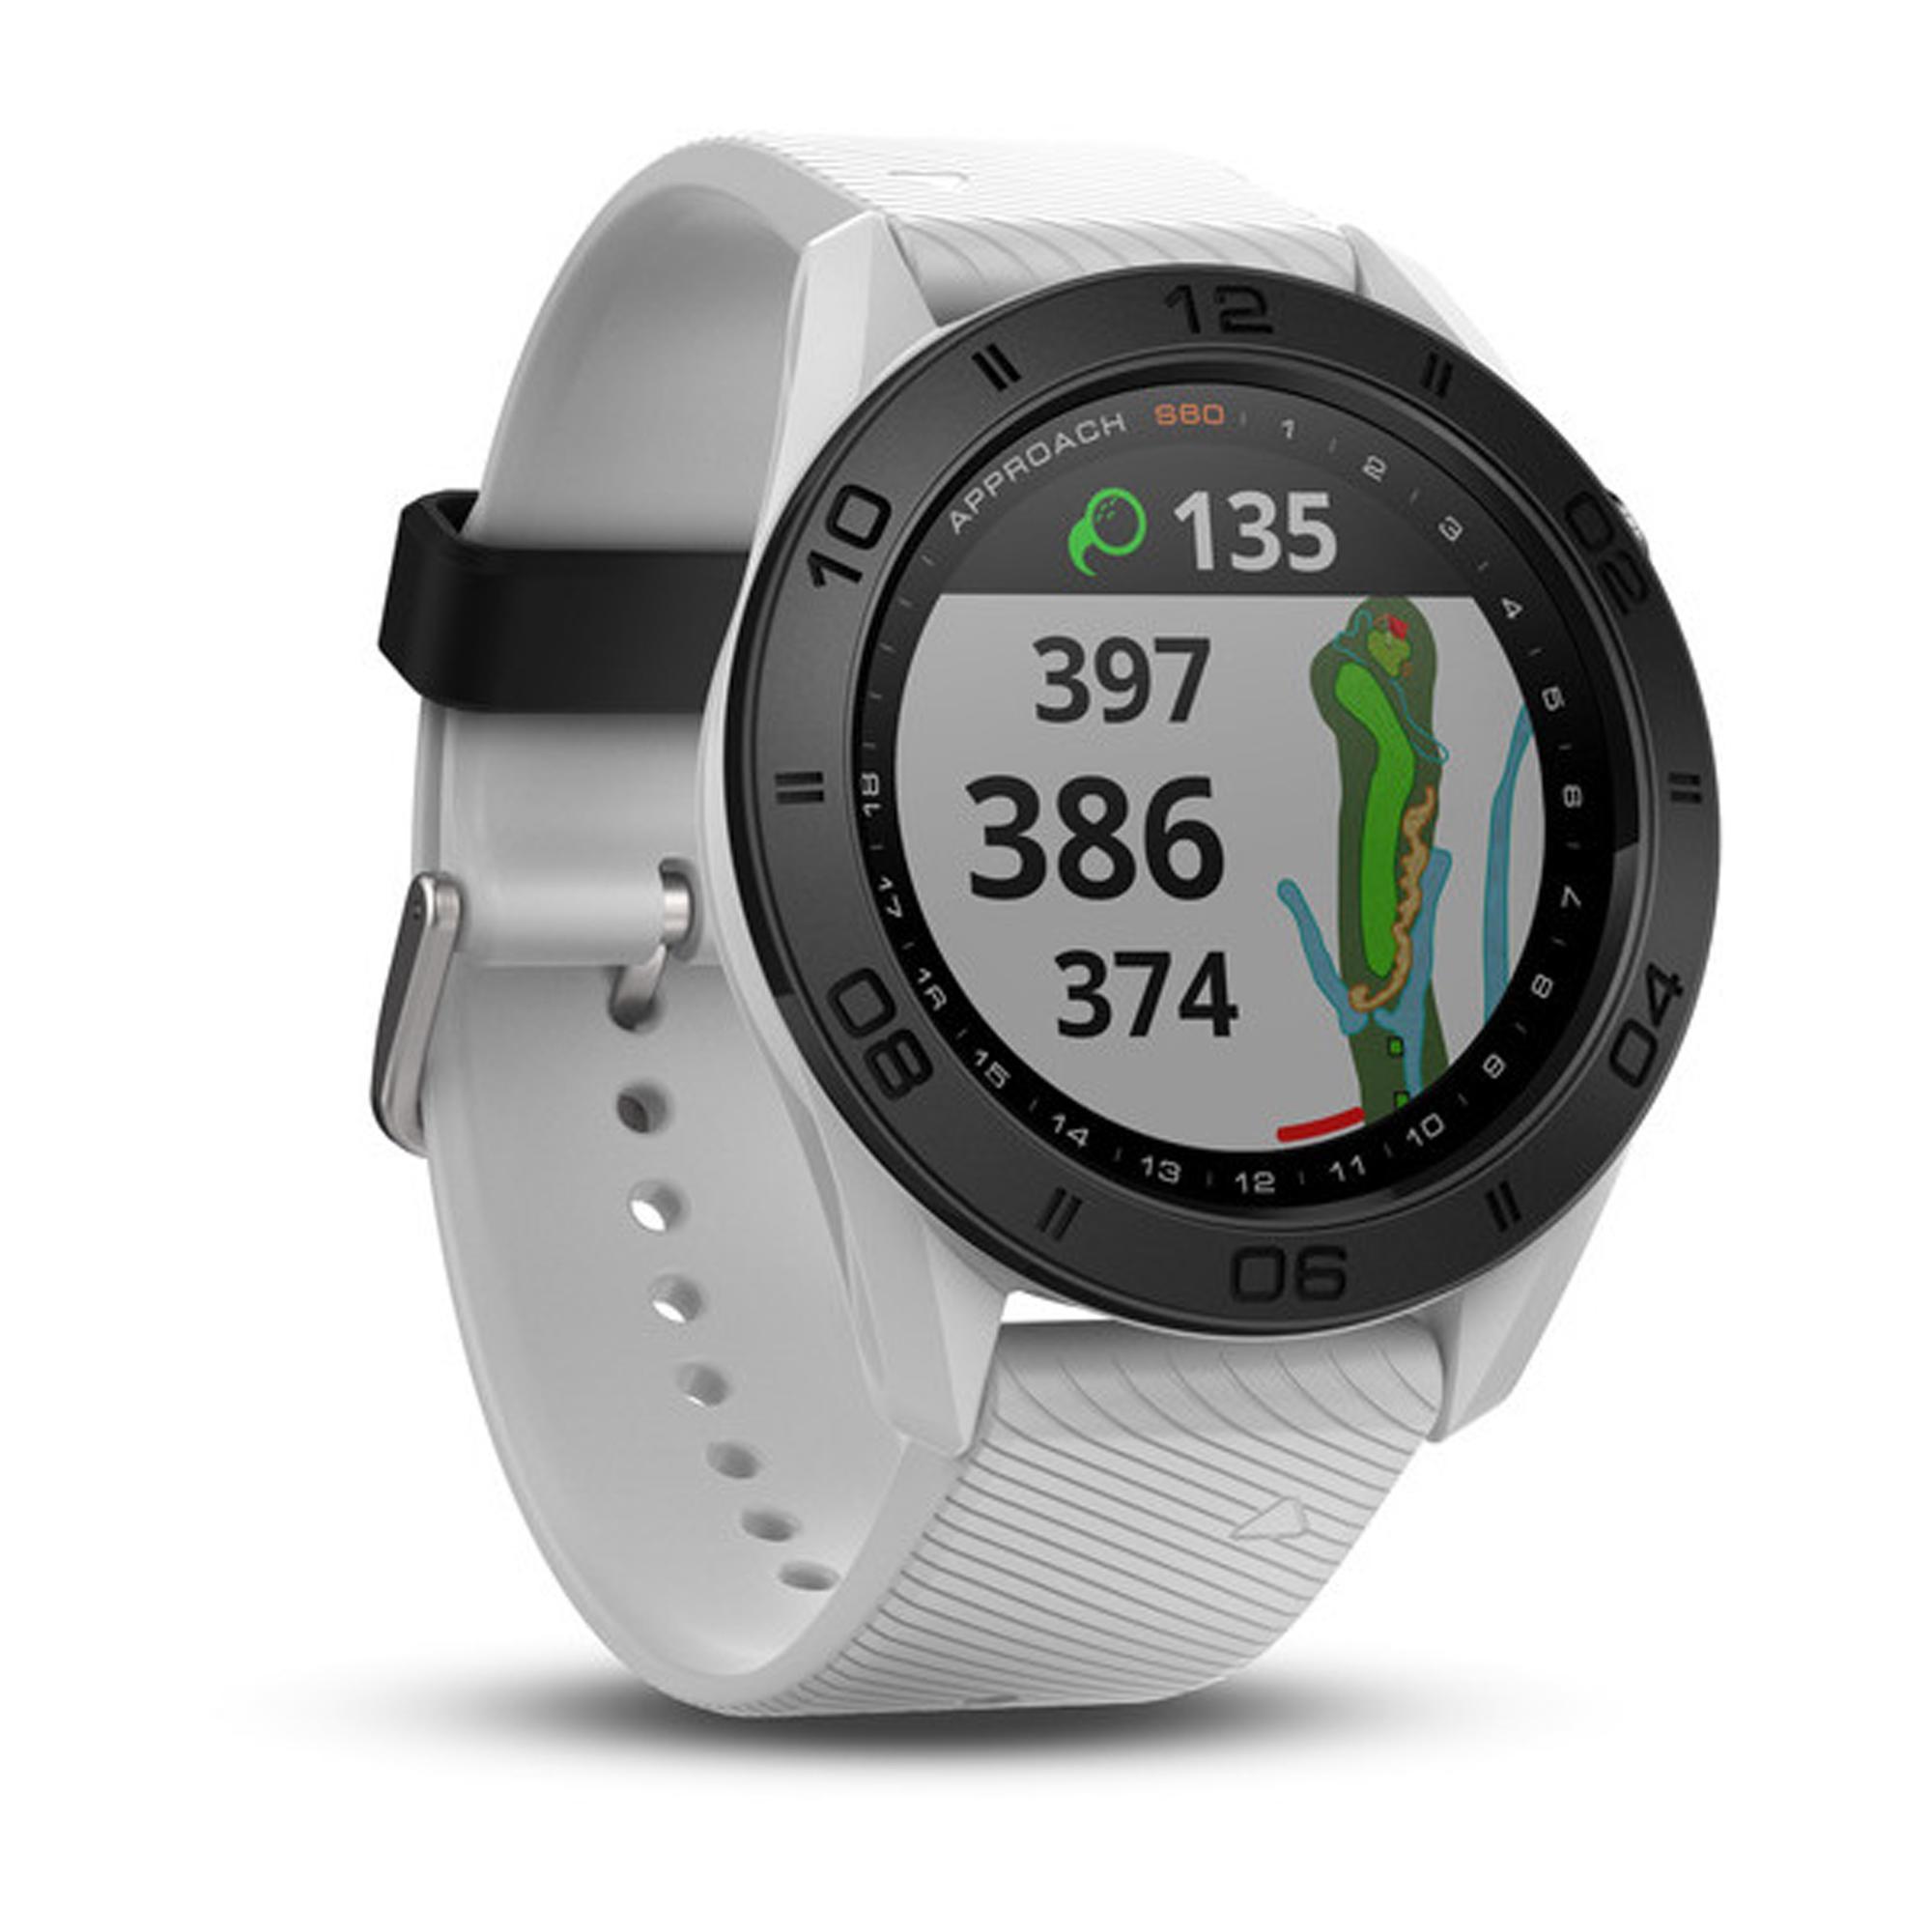 Garmin Gps-golfhorloge Approach S60 wit